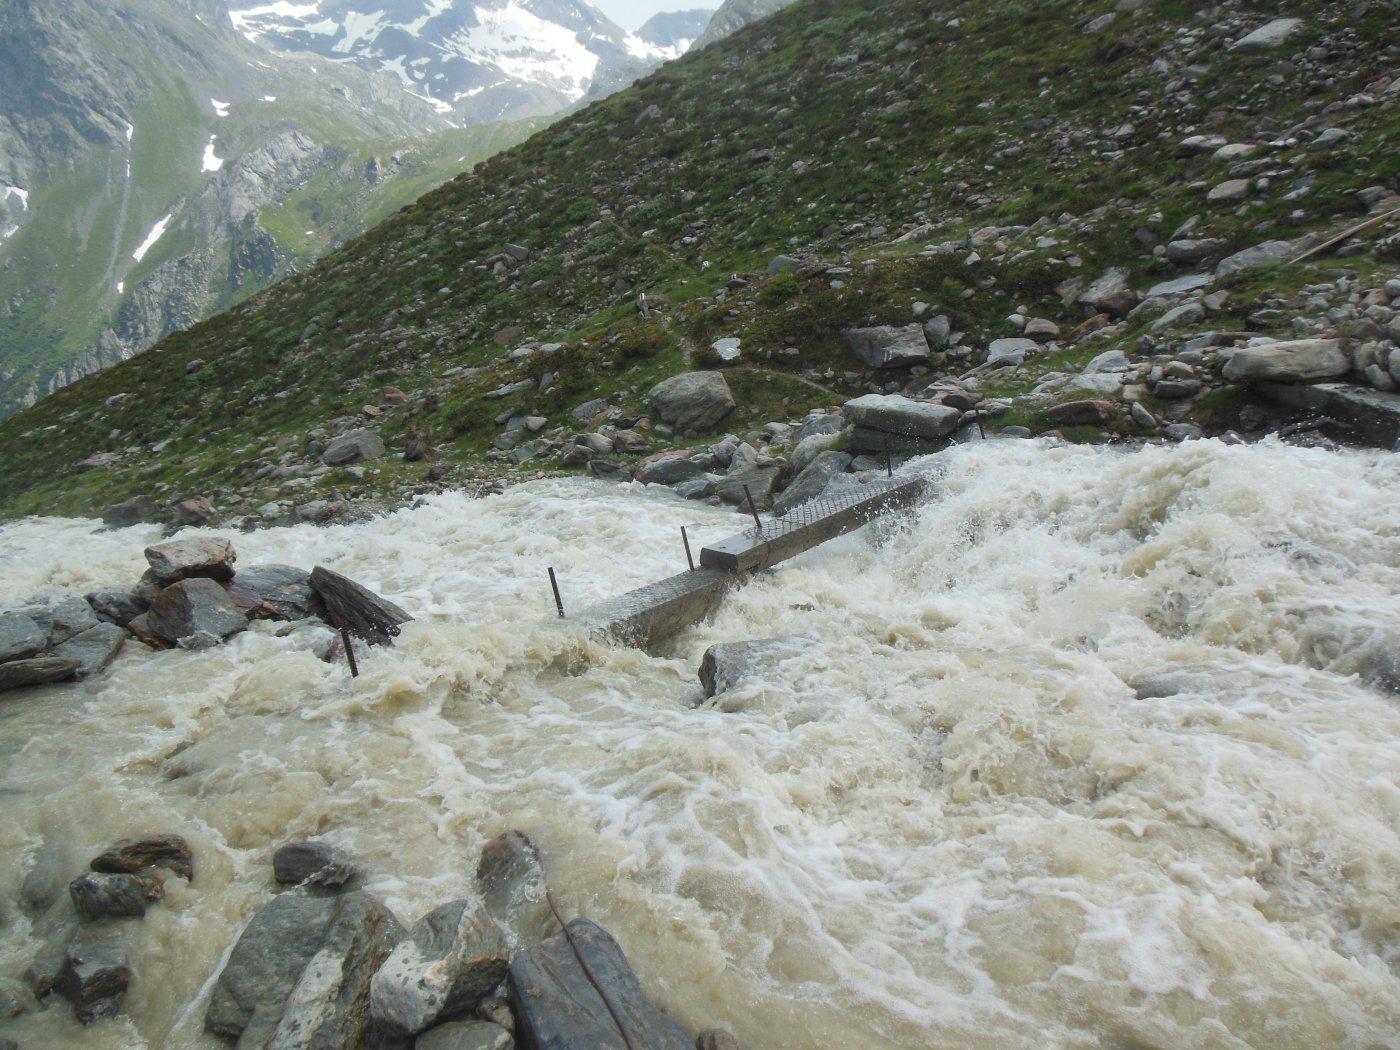 ponte su torrente del ghiacciaio del Lagginhorn